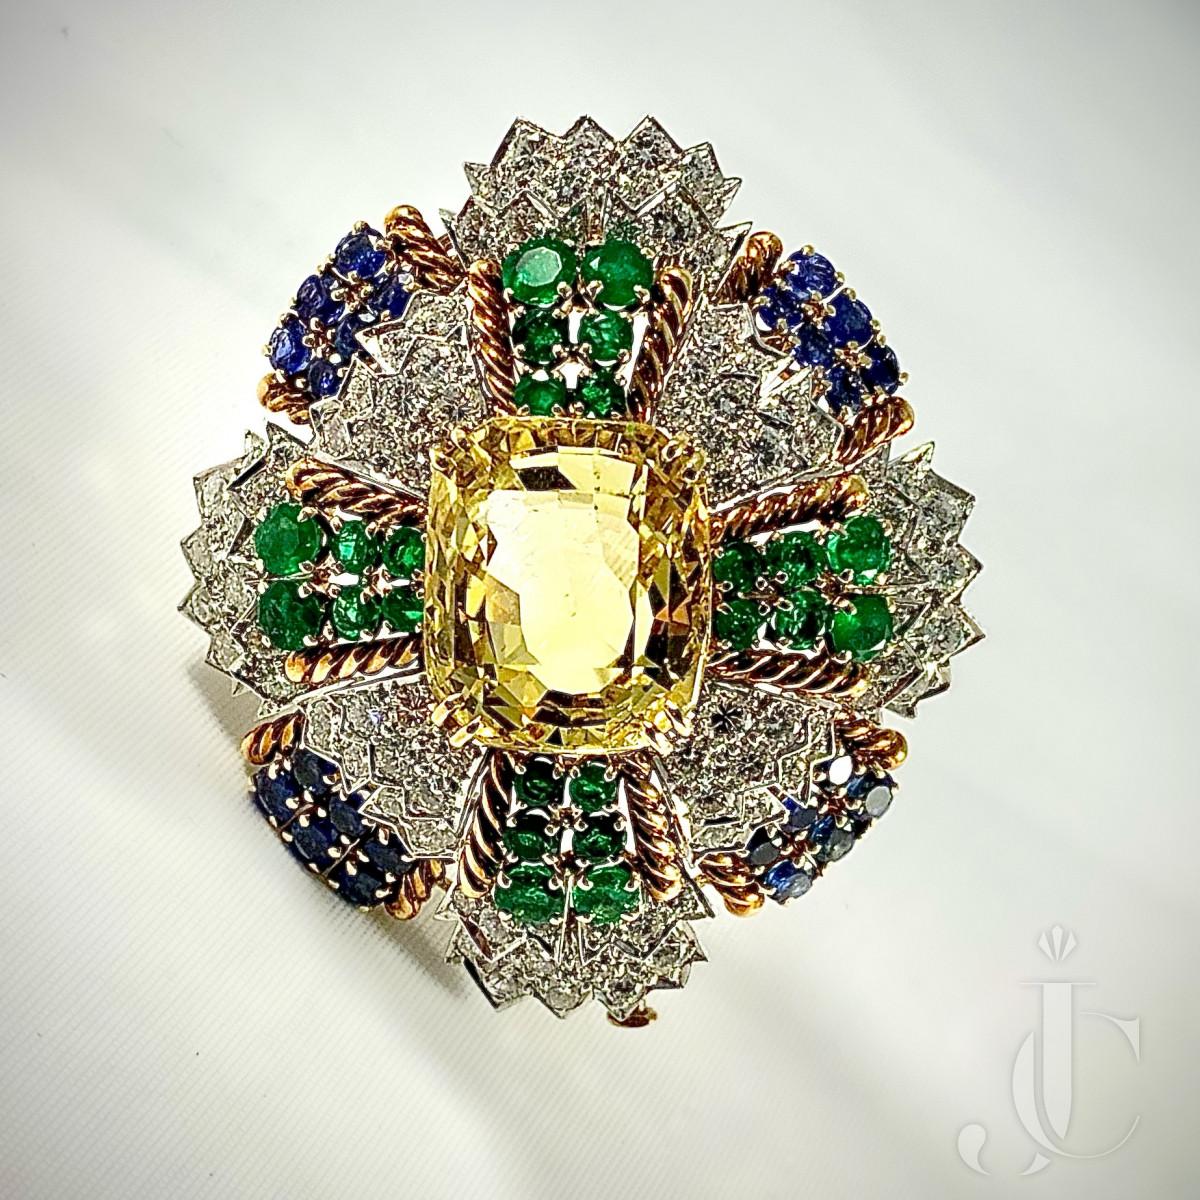 David Webb 18kt Yellow Gold, Diamond and Gemset Brooch